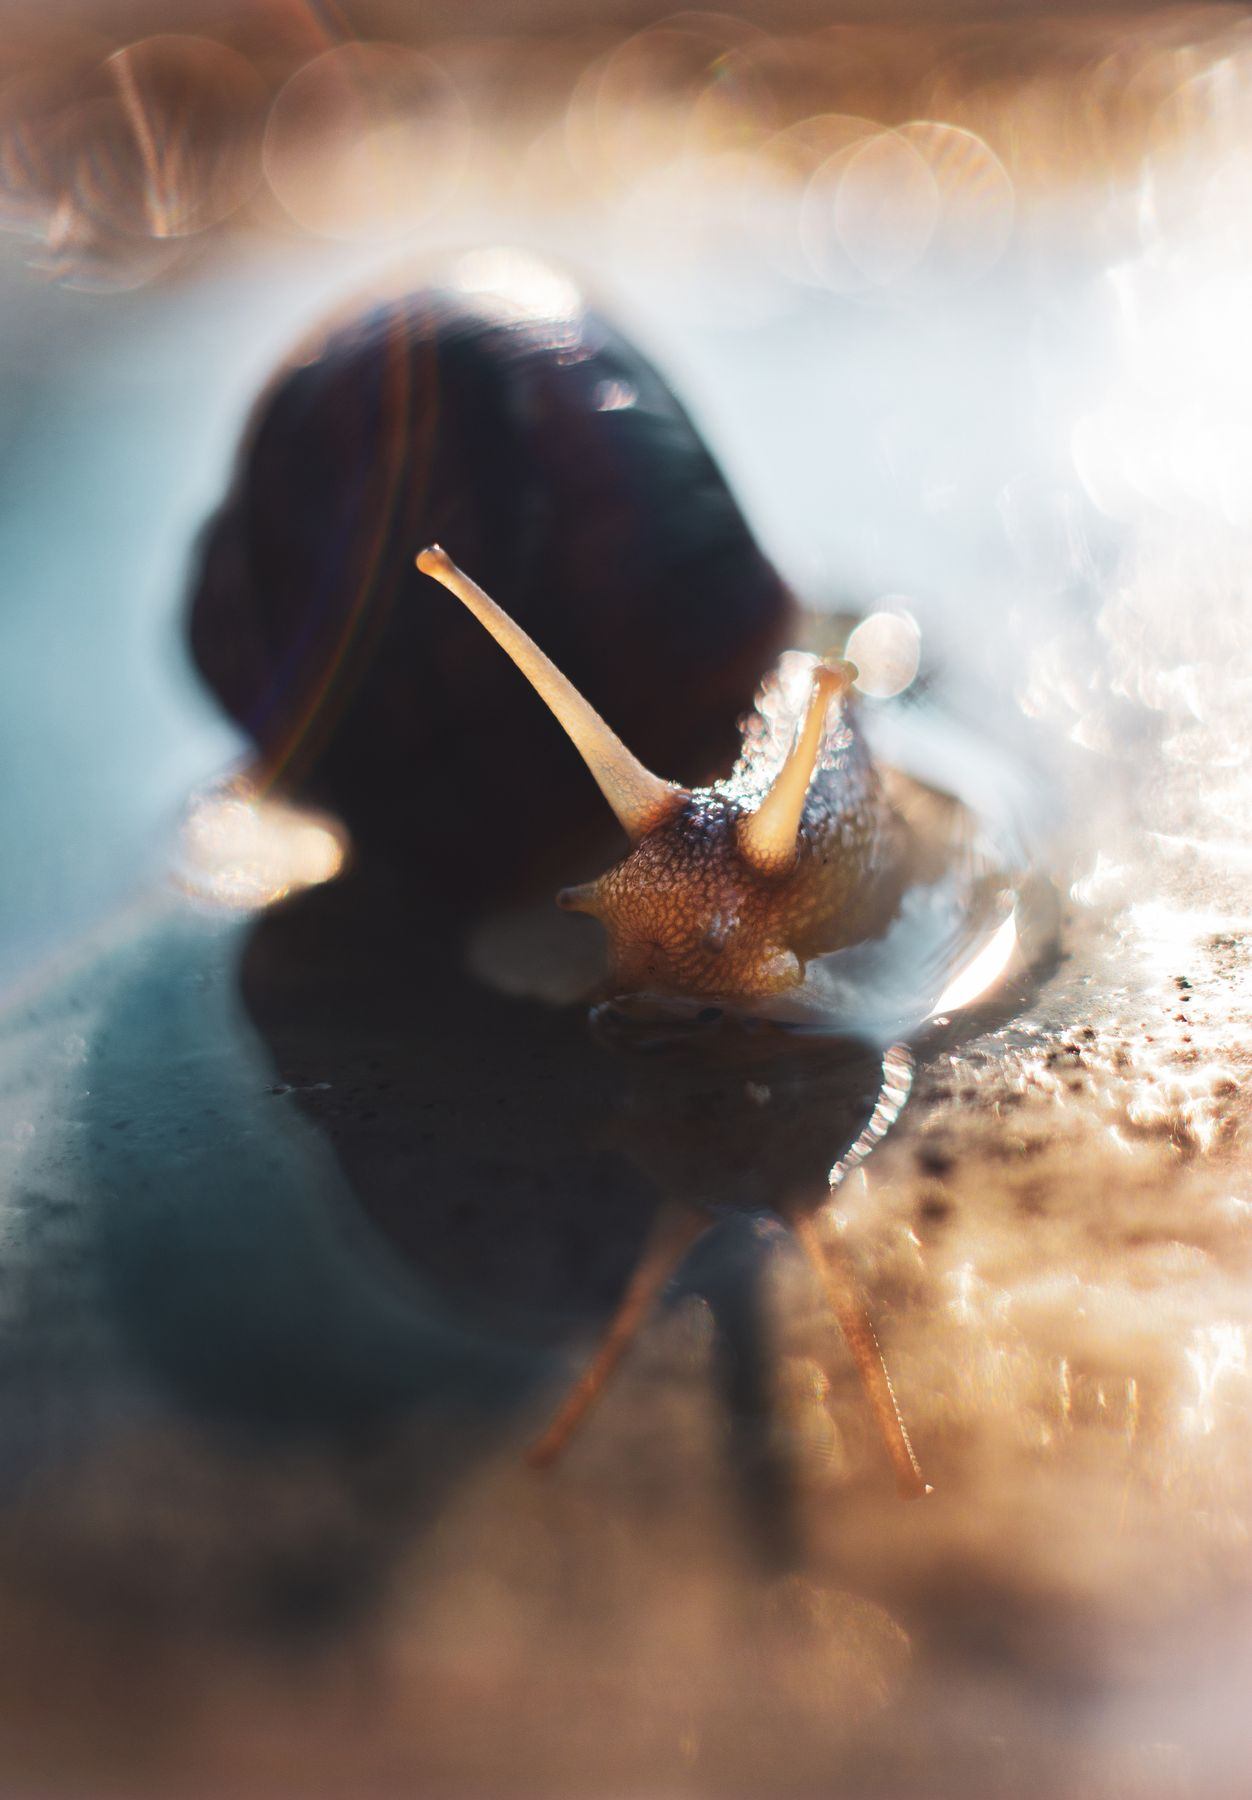 Sunset Bathing snail shell water wet bokeh light shine reflection horns blue teal orange yellow brown house look вода улитка раковина мокрый рожки отражение голубой оранжевый боке свет deep dark